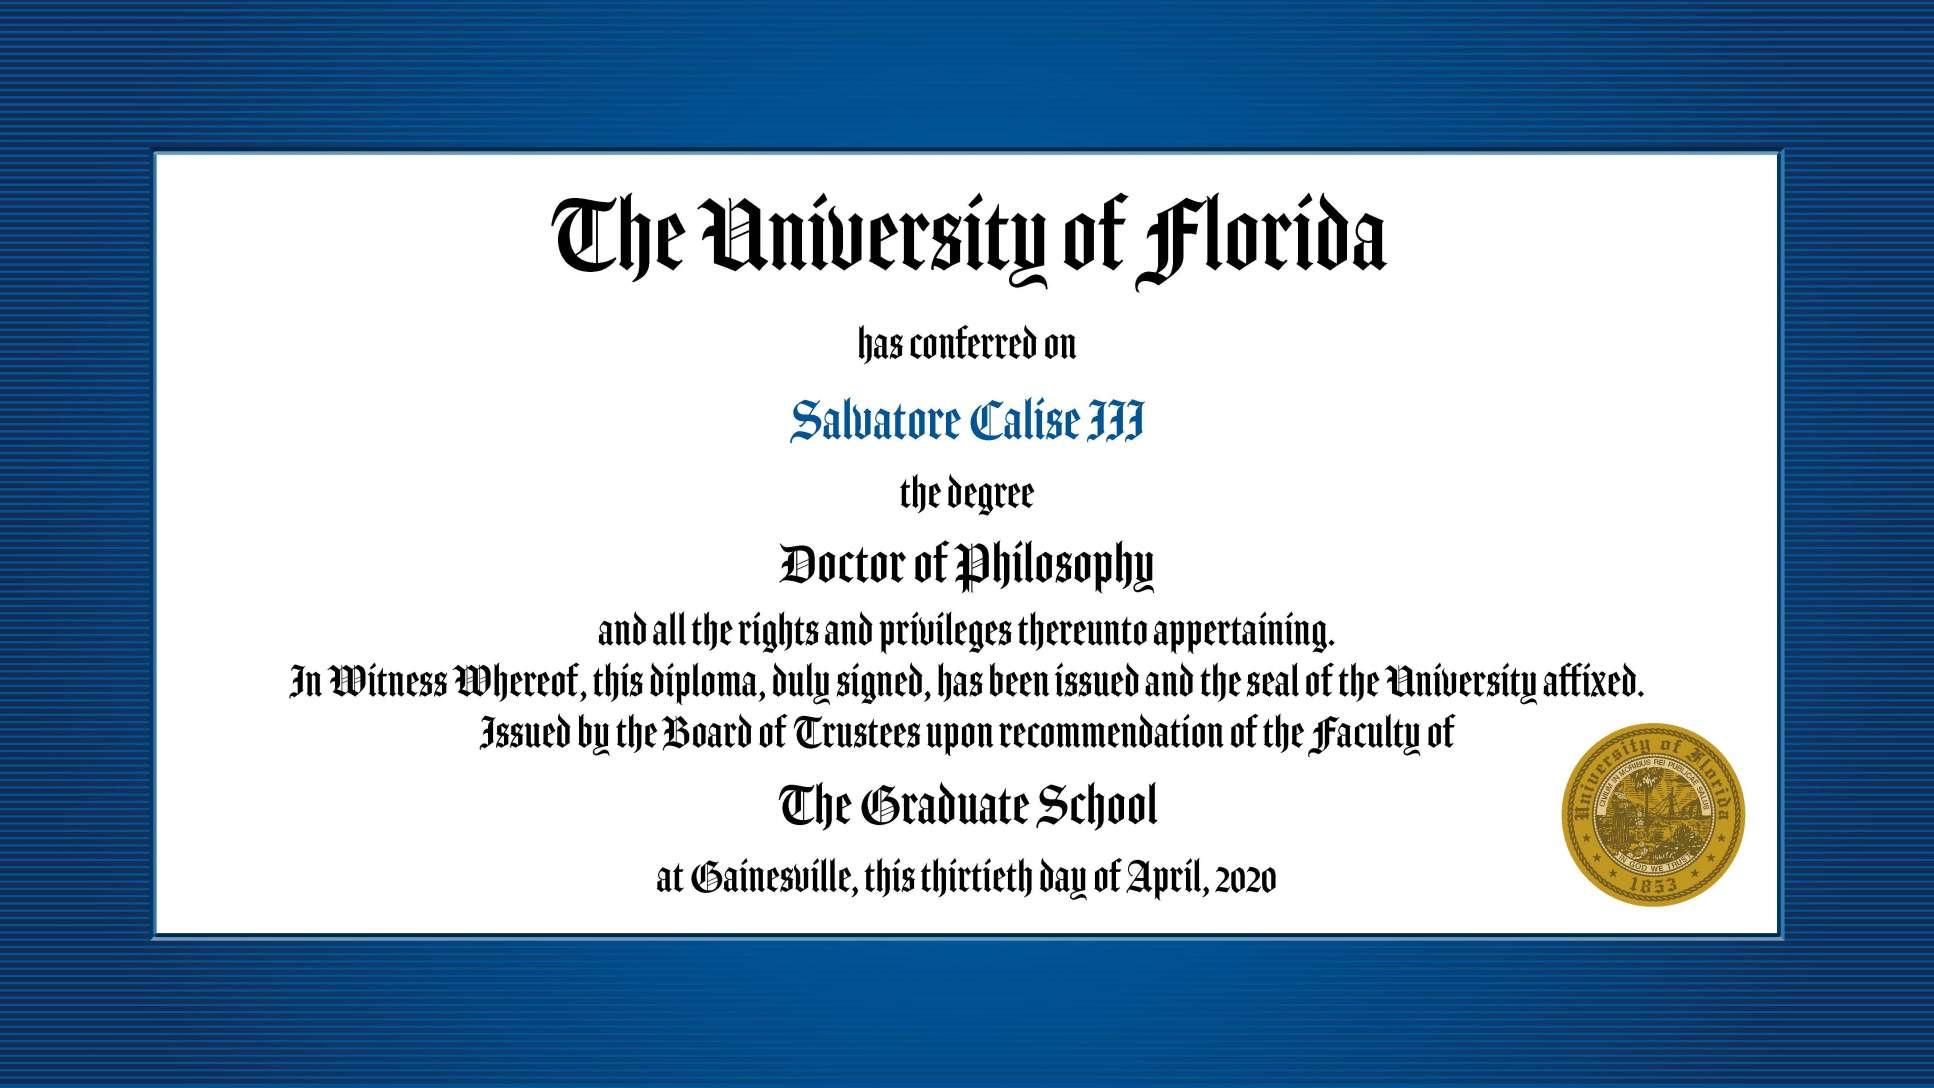 Doctor of Philosophy diploma for John Calise